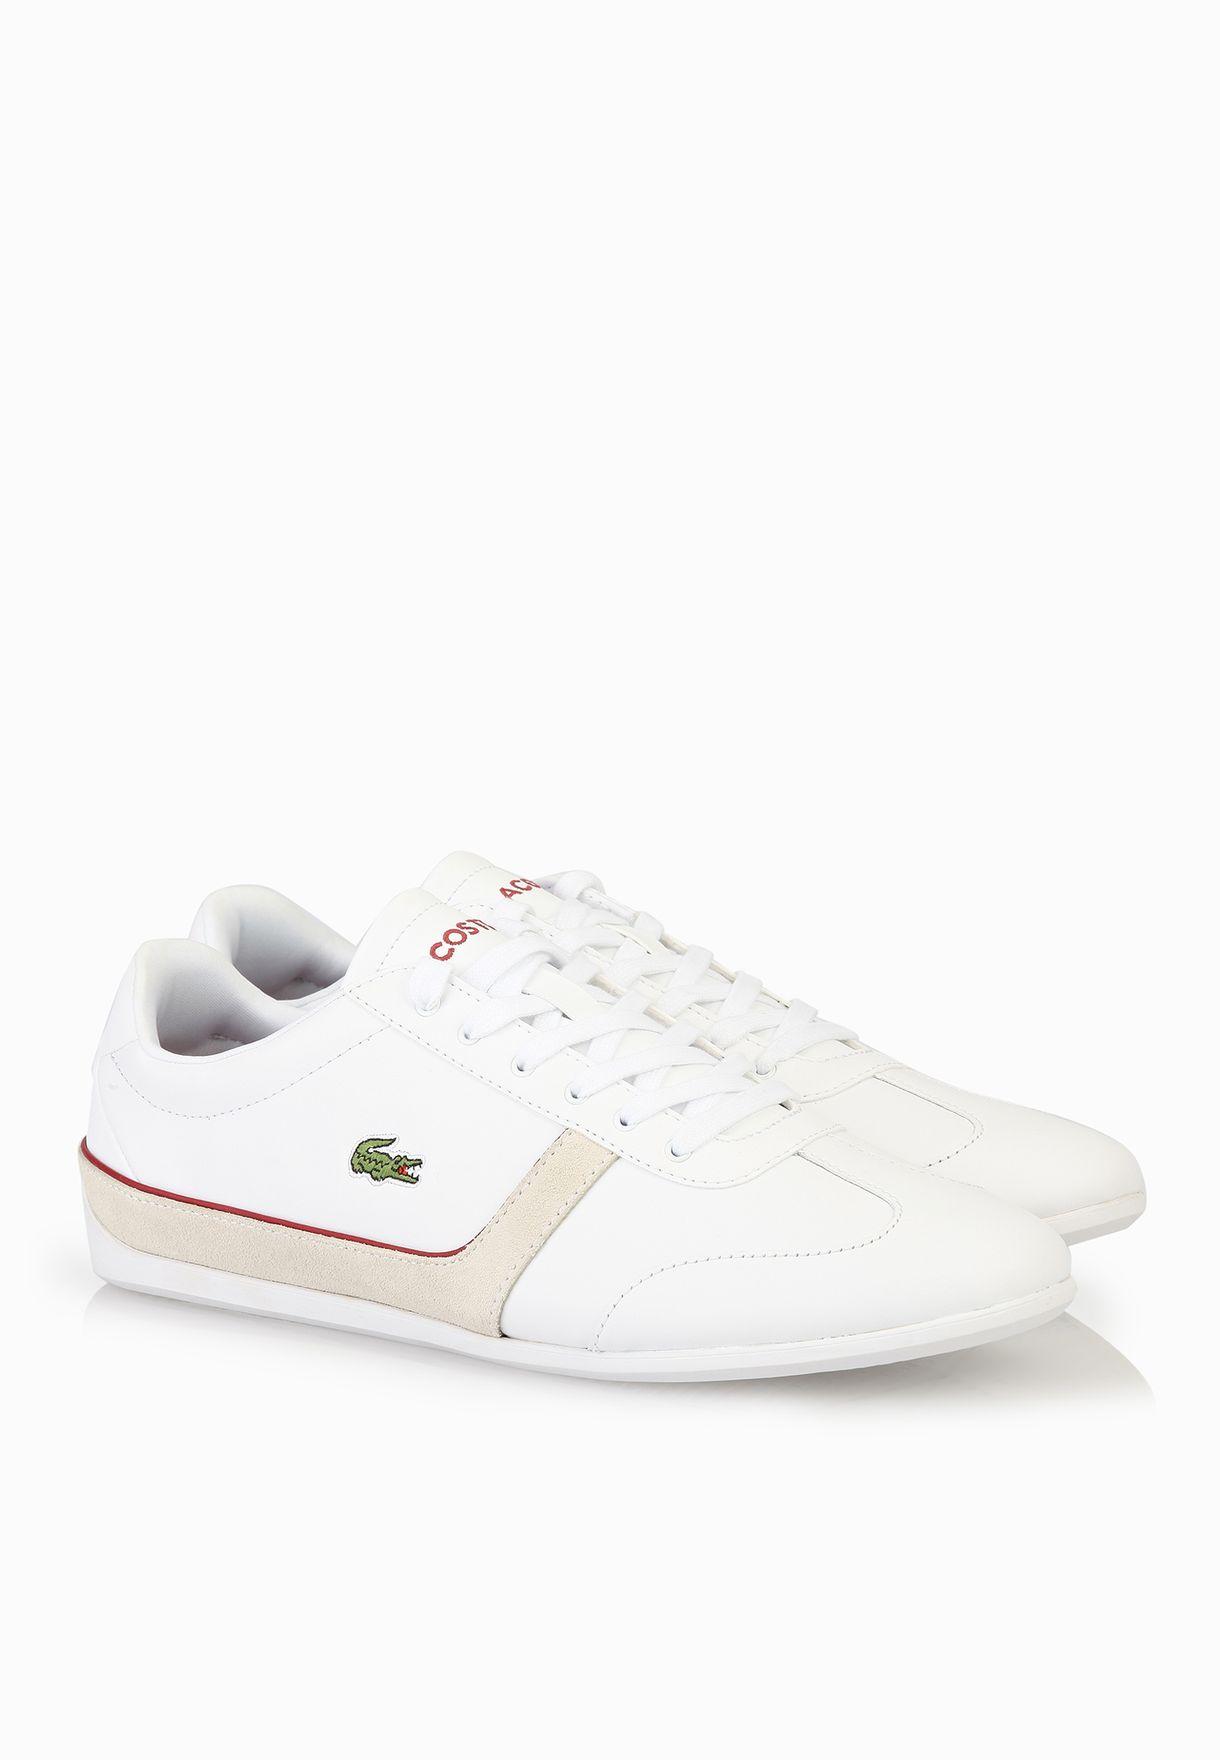 55453e927 Shop Lacoste white Missano Sport TRC Sneakers 30SPW0015-21G for ...